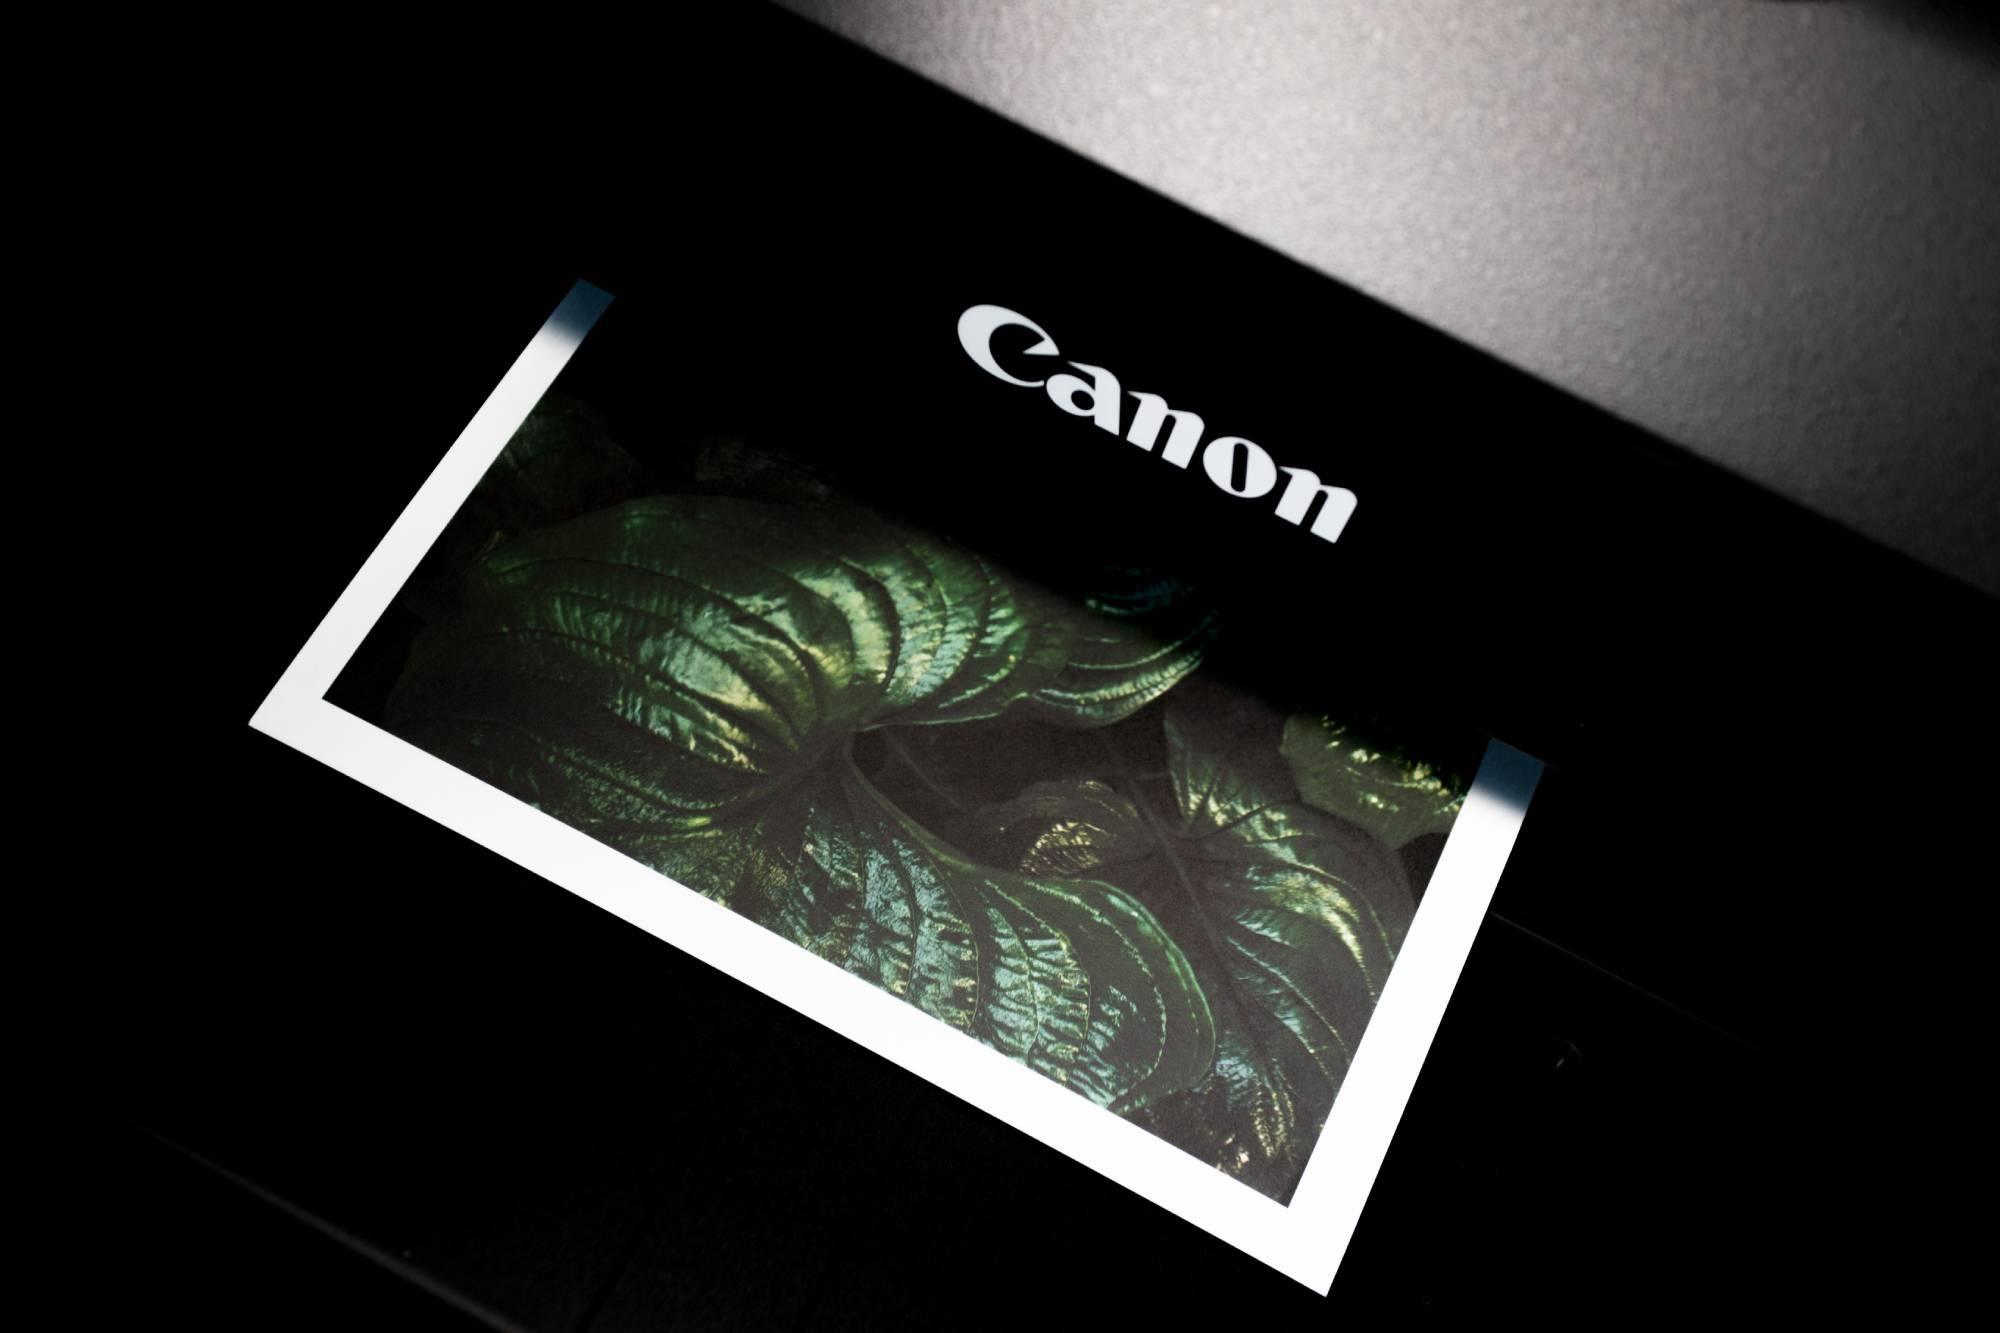 printing an image on a canon photo printer